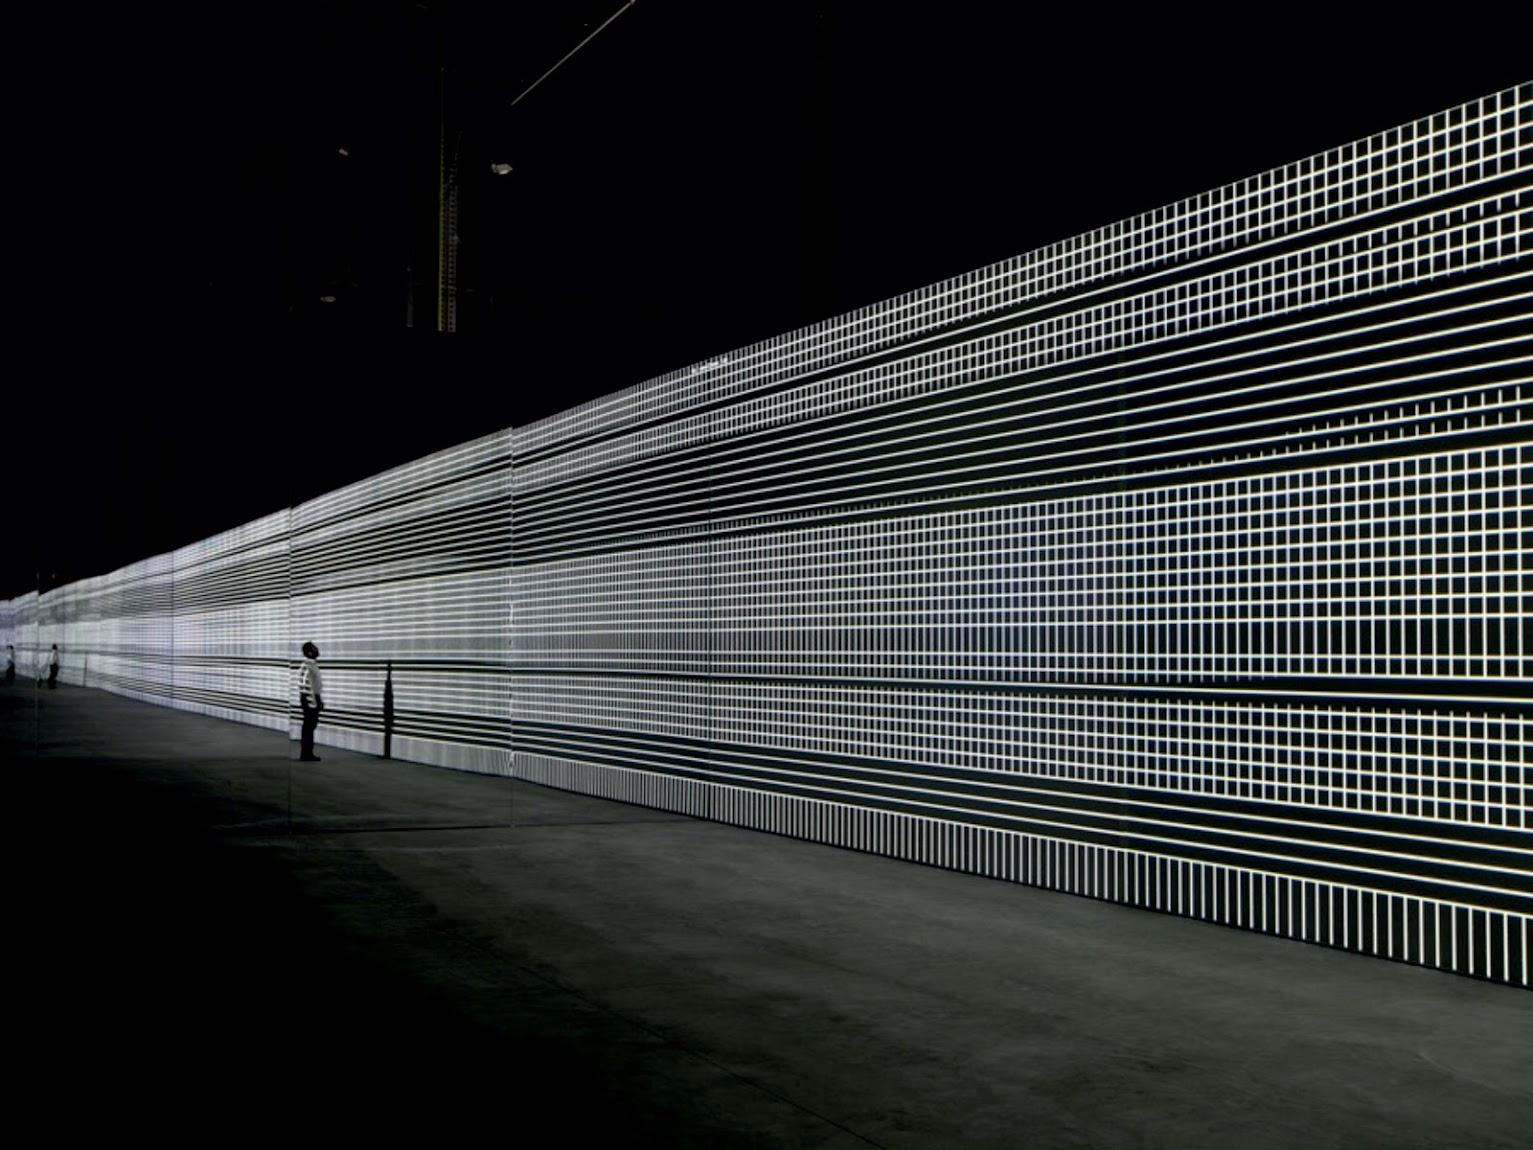 Bicocca, 20126 Milano, Italia: Unidisplay by Carsten Nicolai